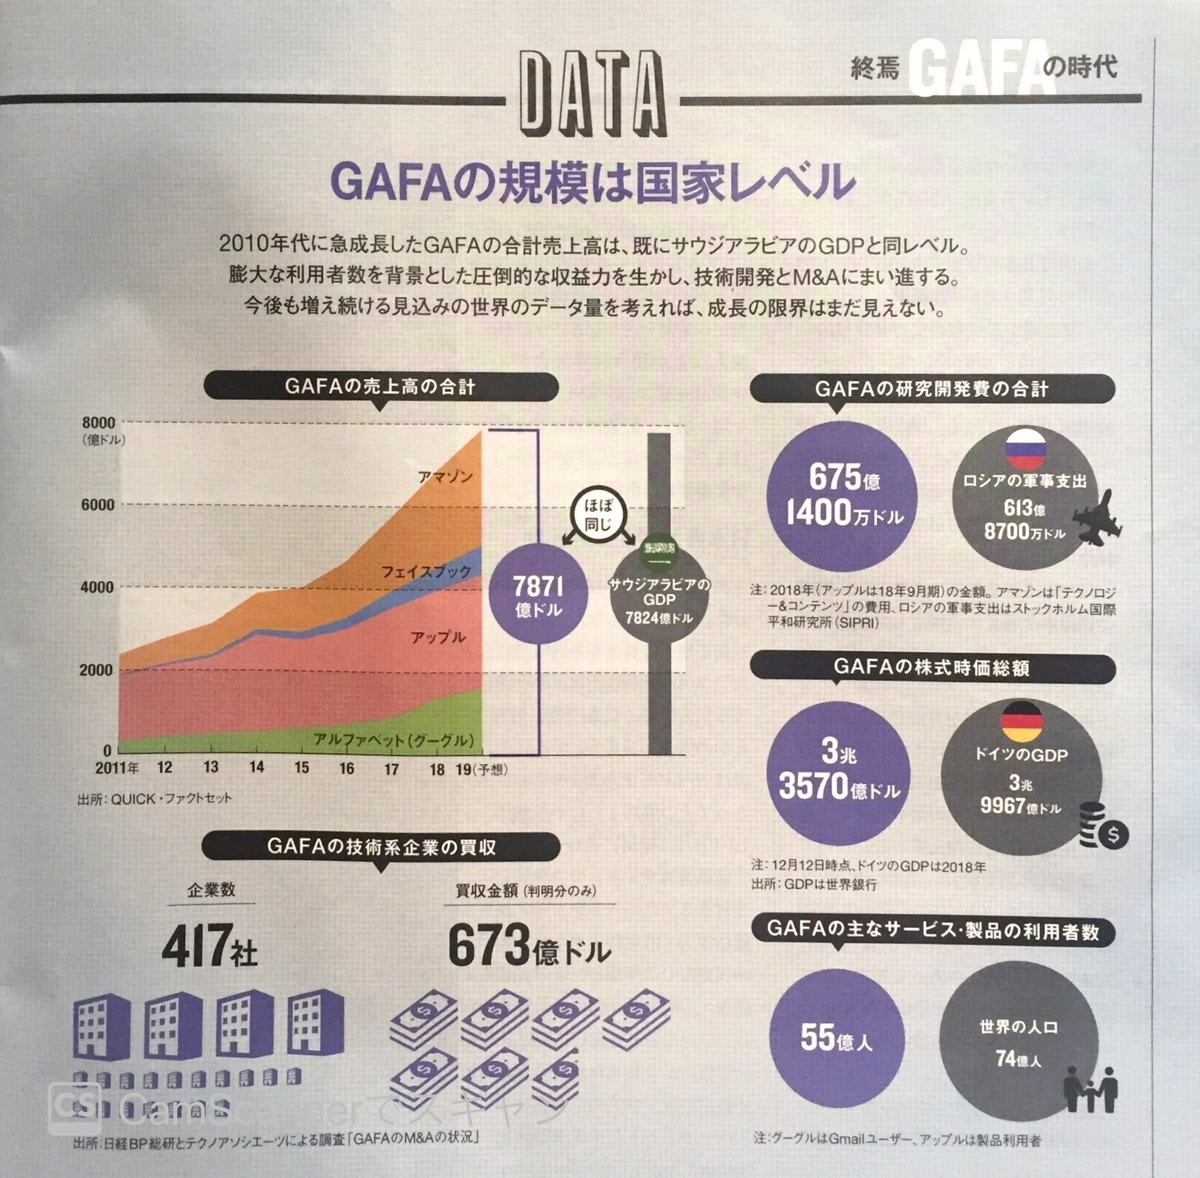 GAFAに関するデータ